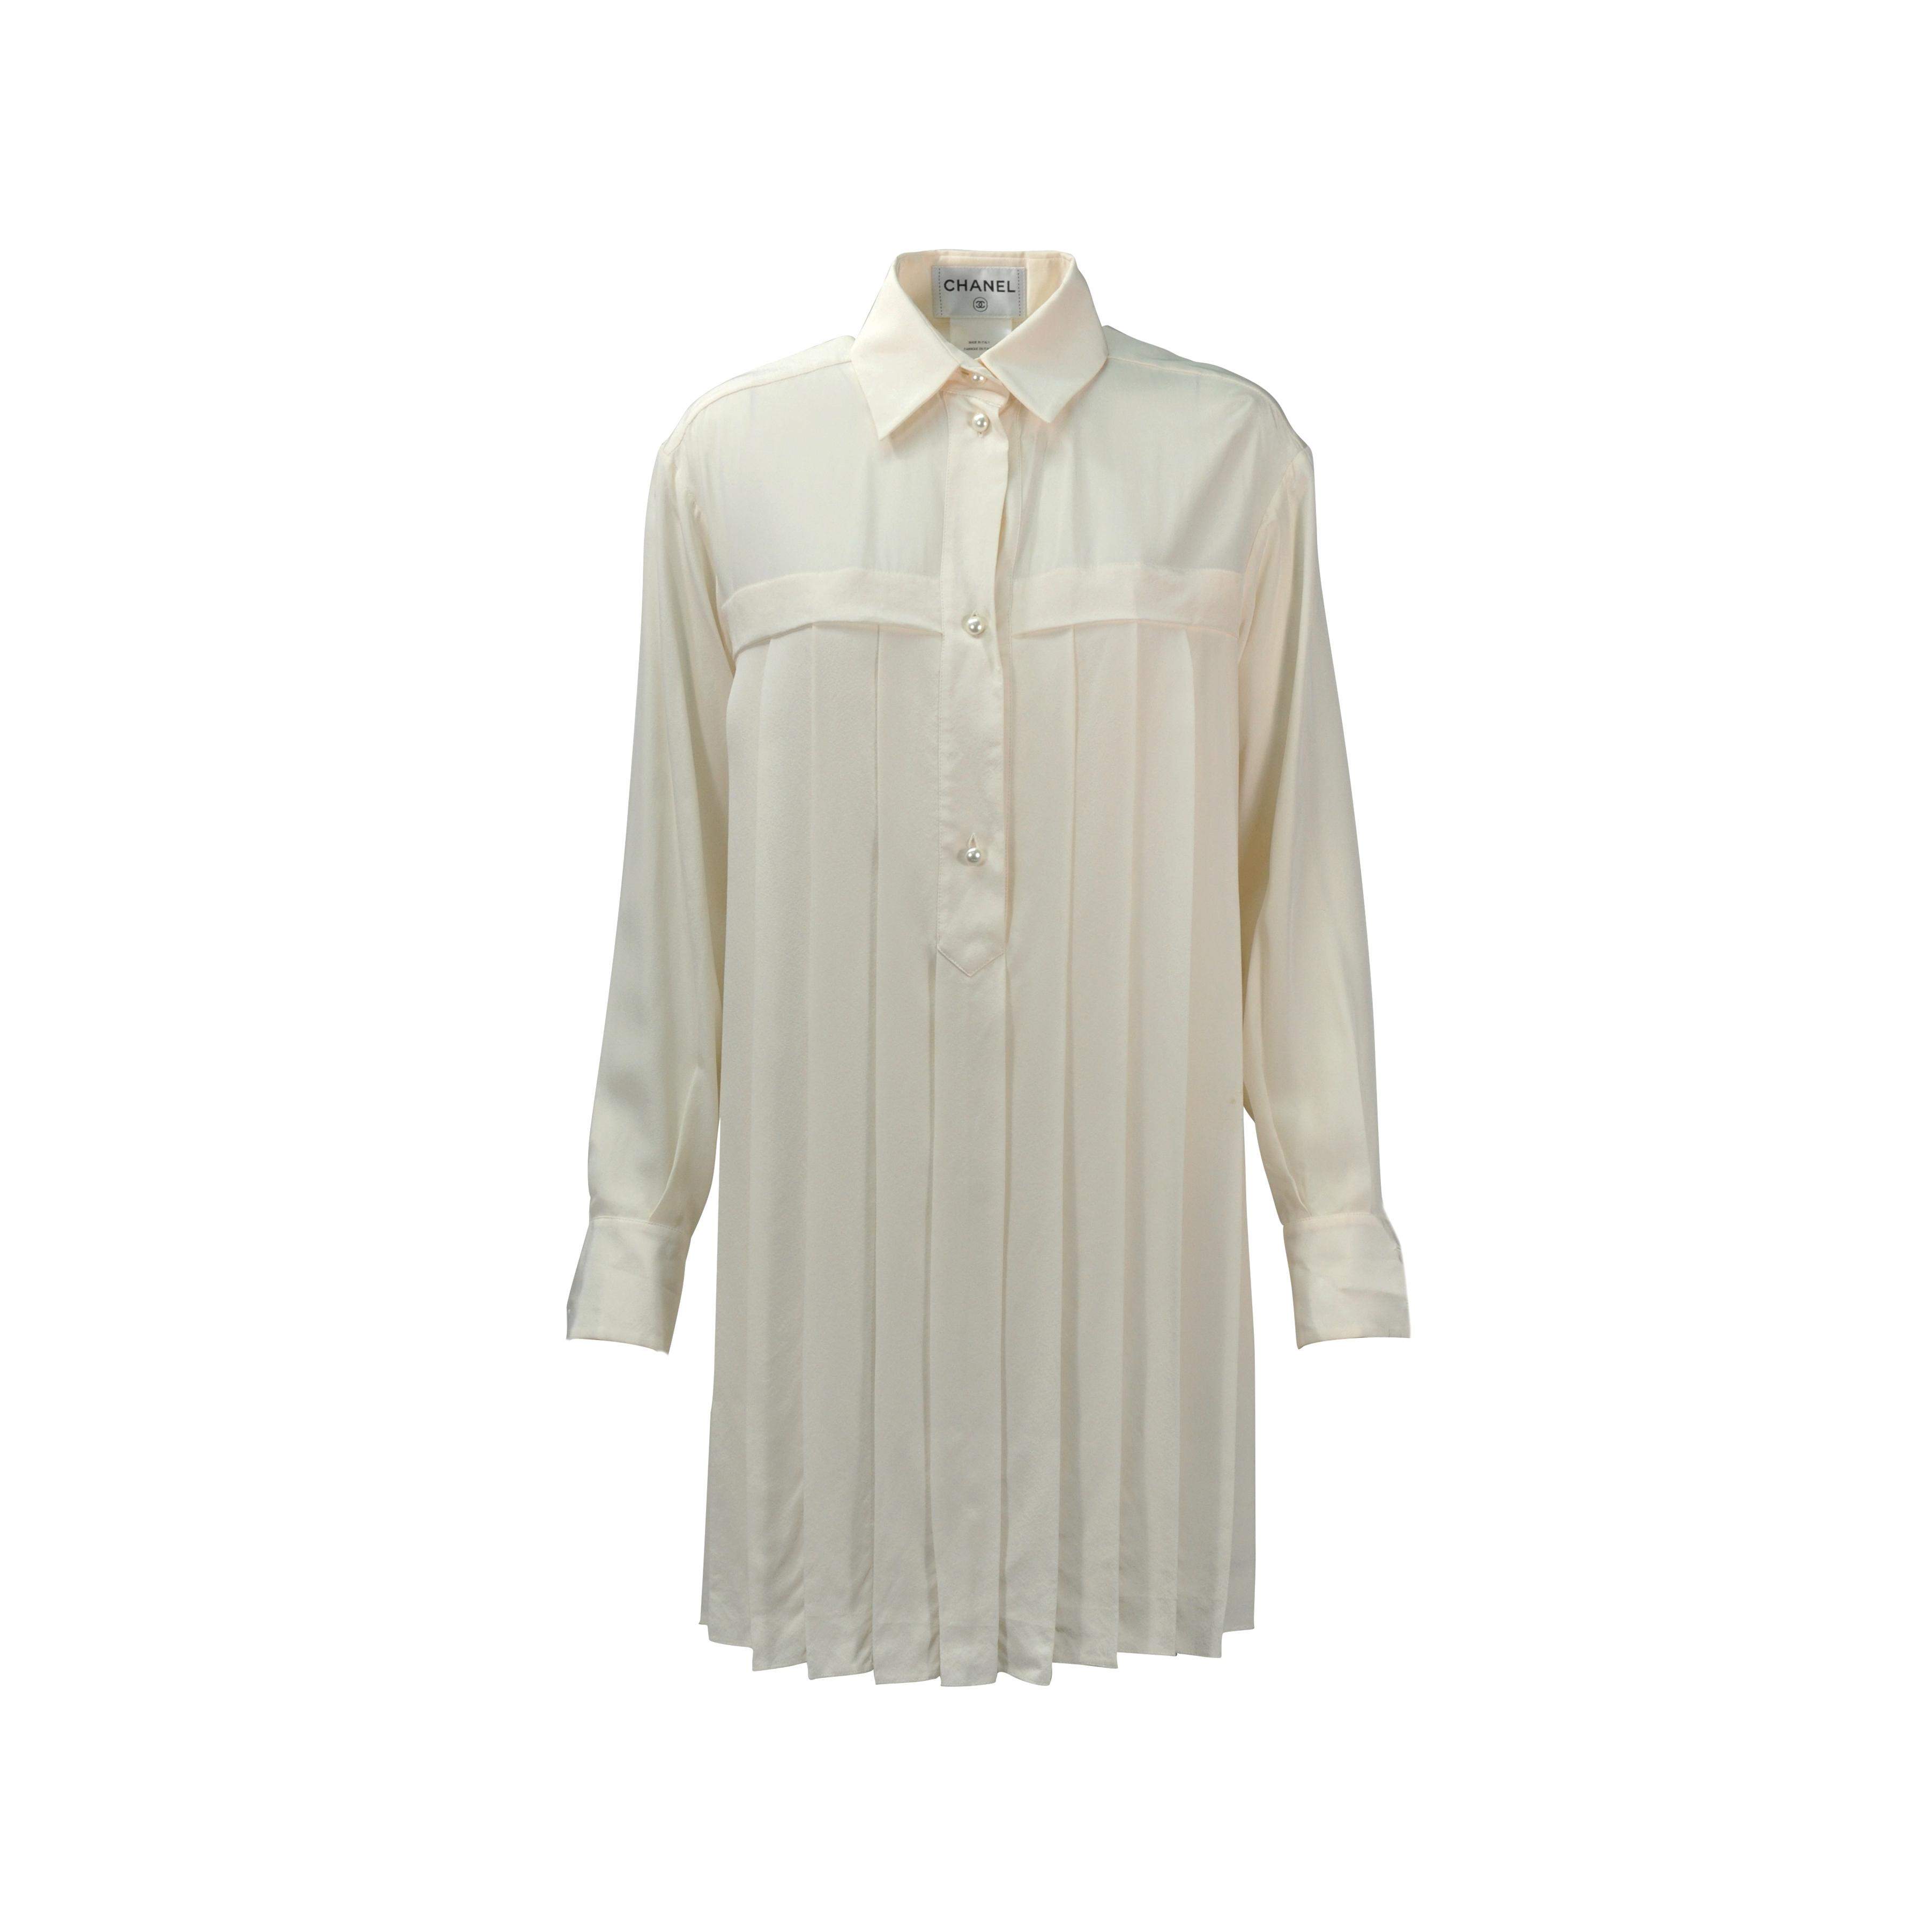 8eb8e9328 Chanel Silk Shirt | RLDM